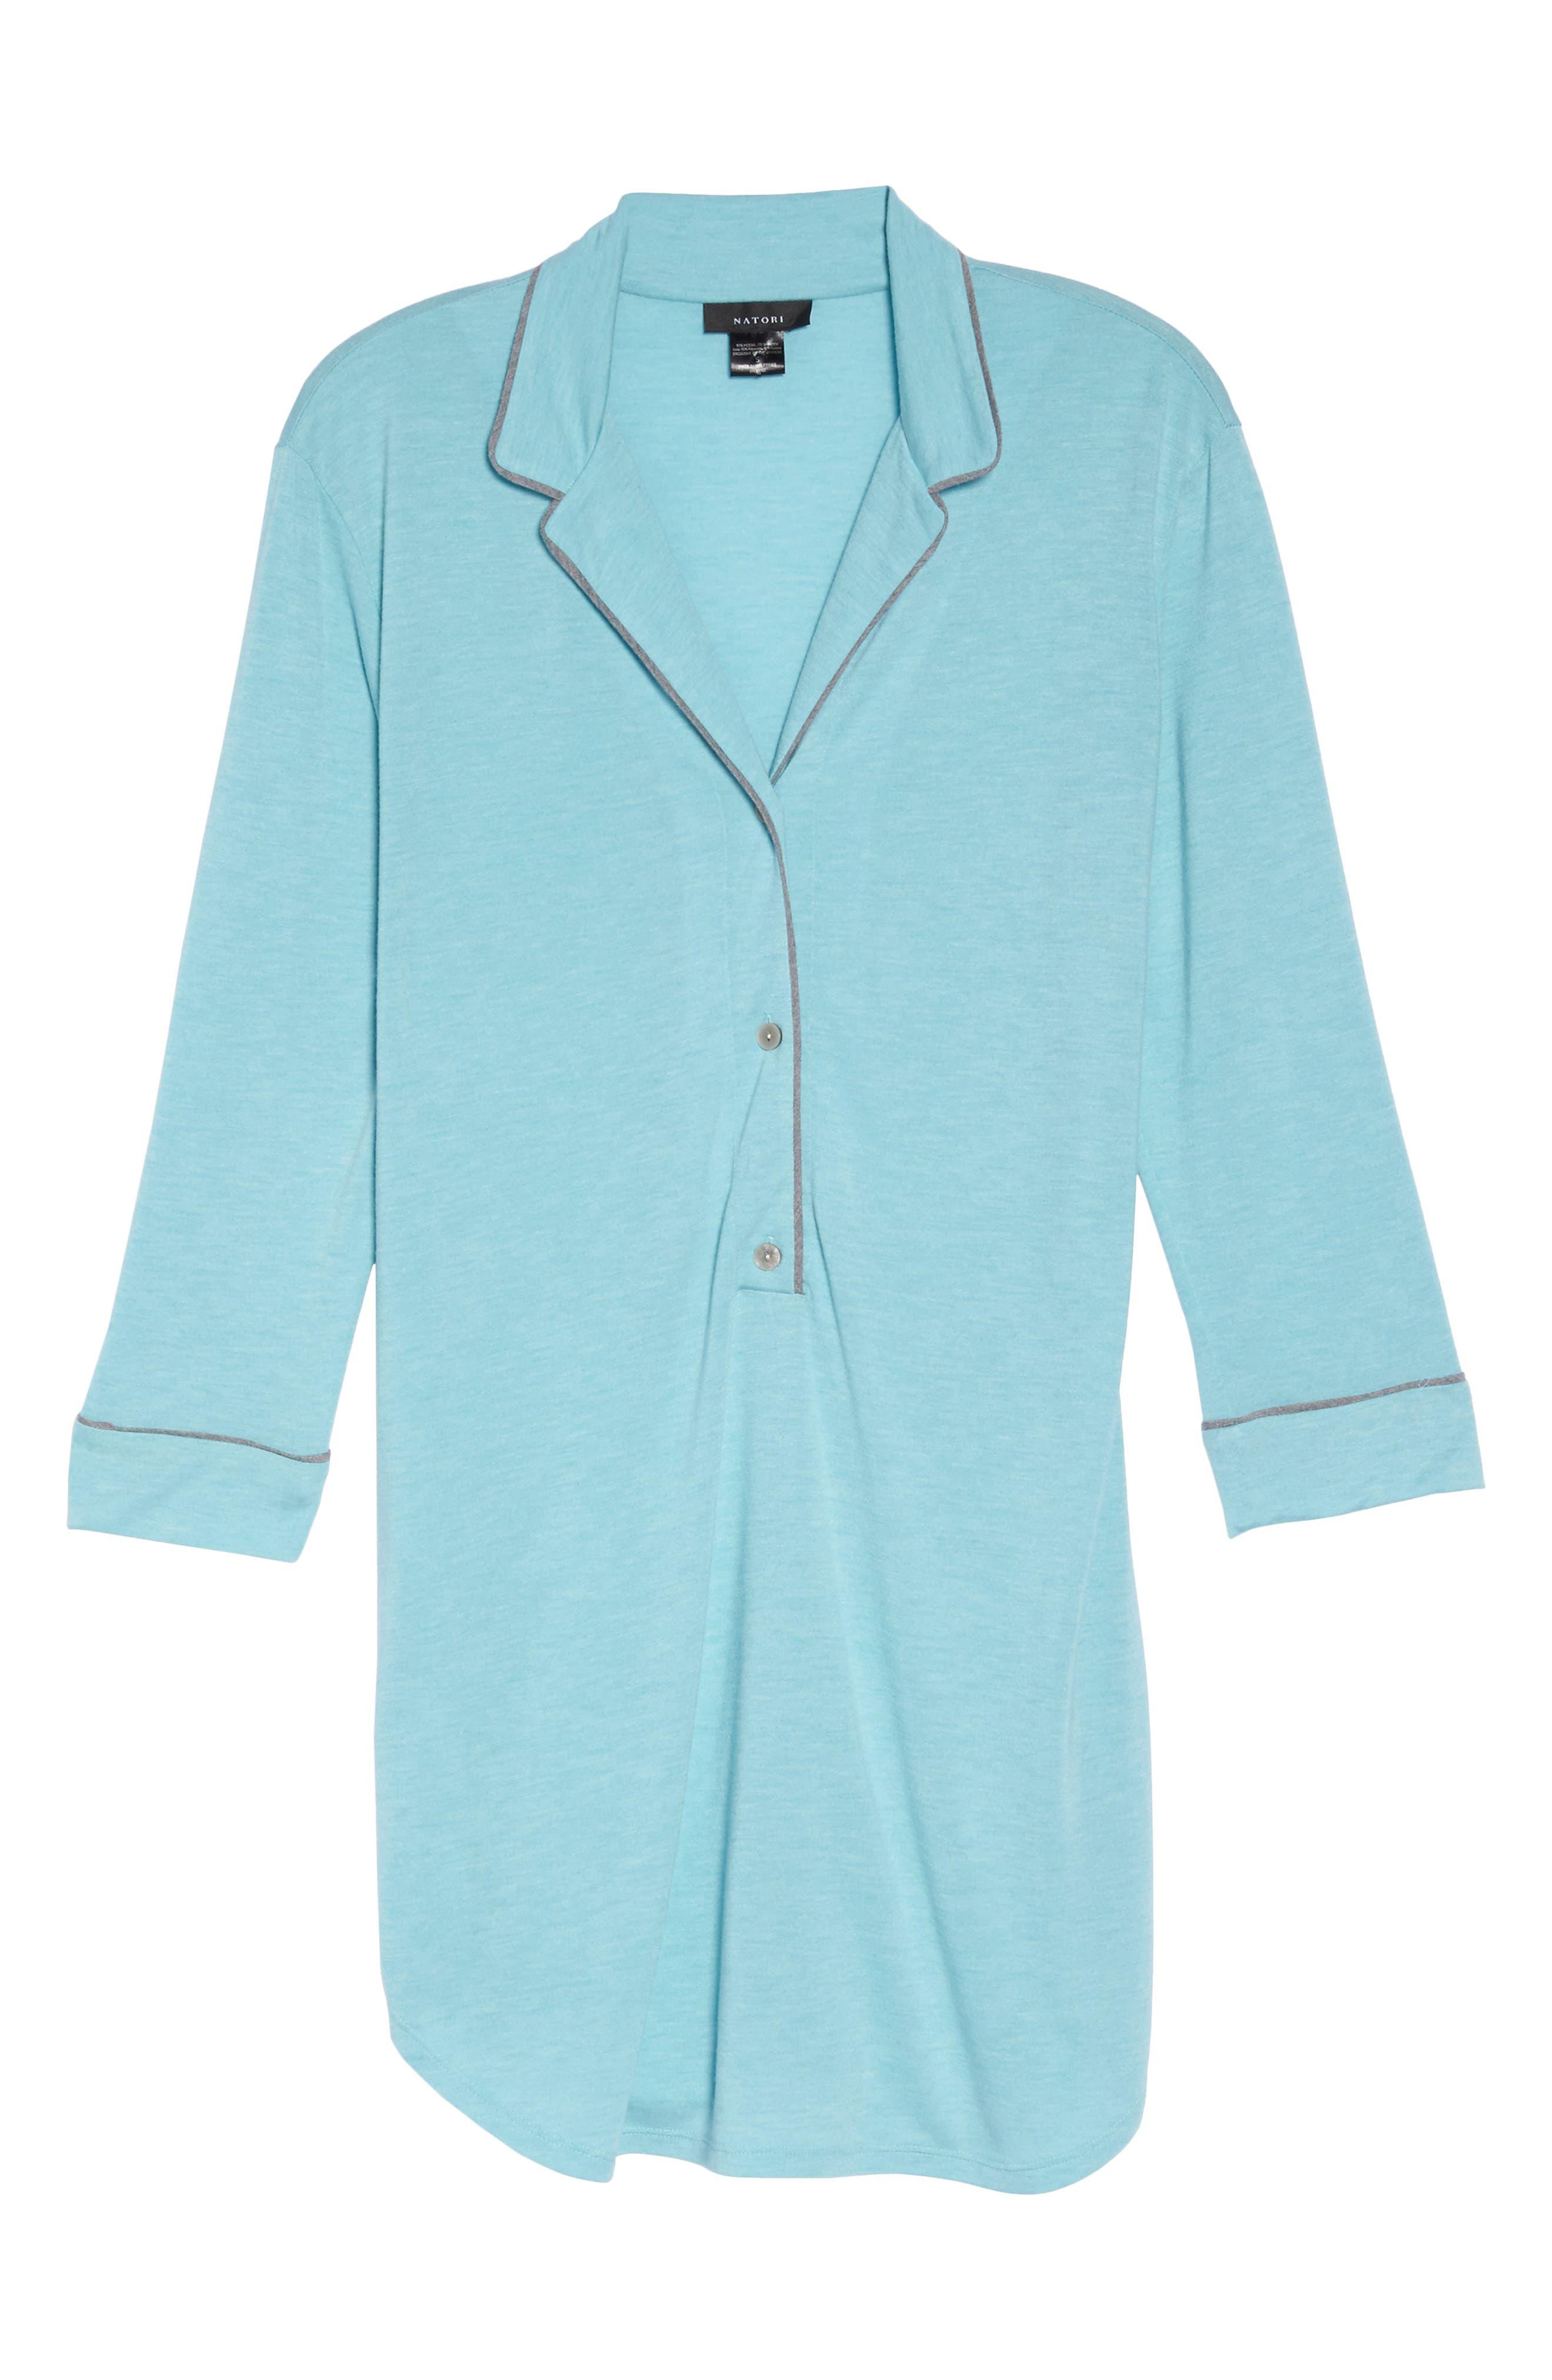 Shangri-La Sleep Shirt,                             Alternate thumbnail 4, color,                             Turquoise